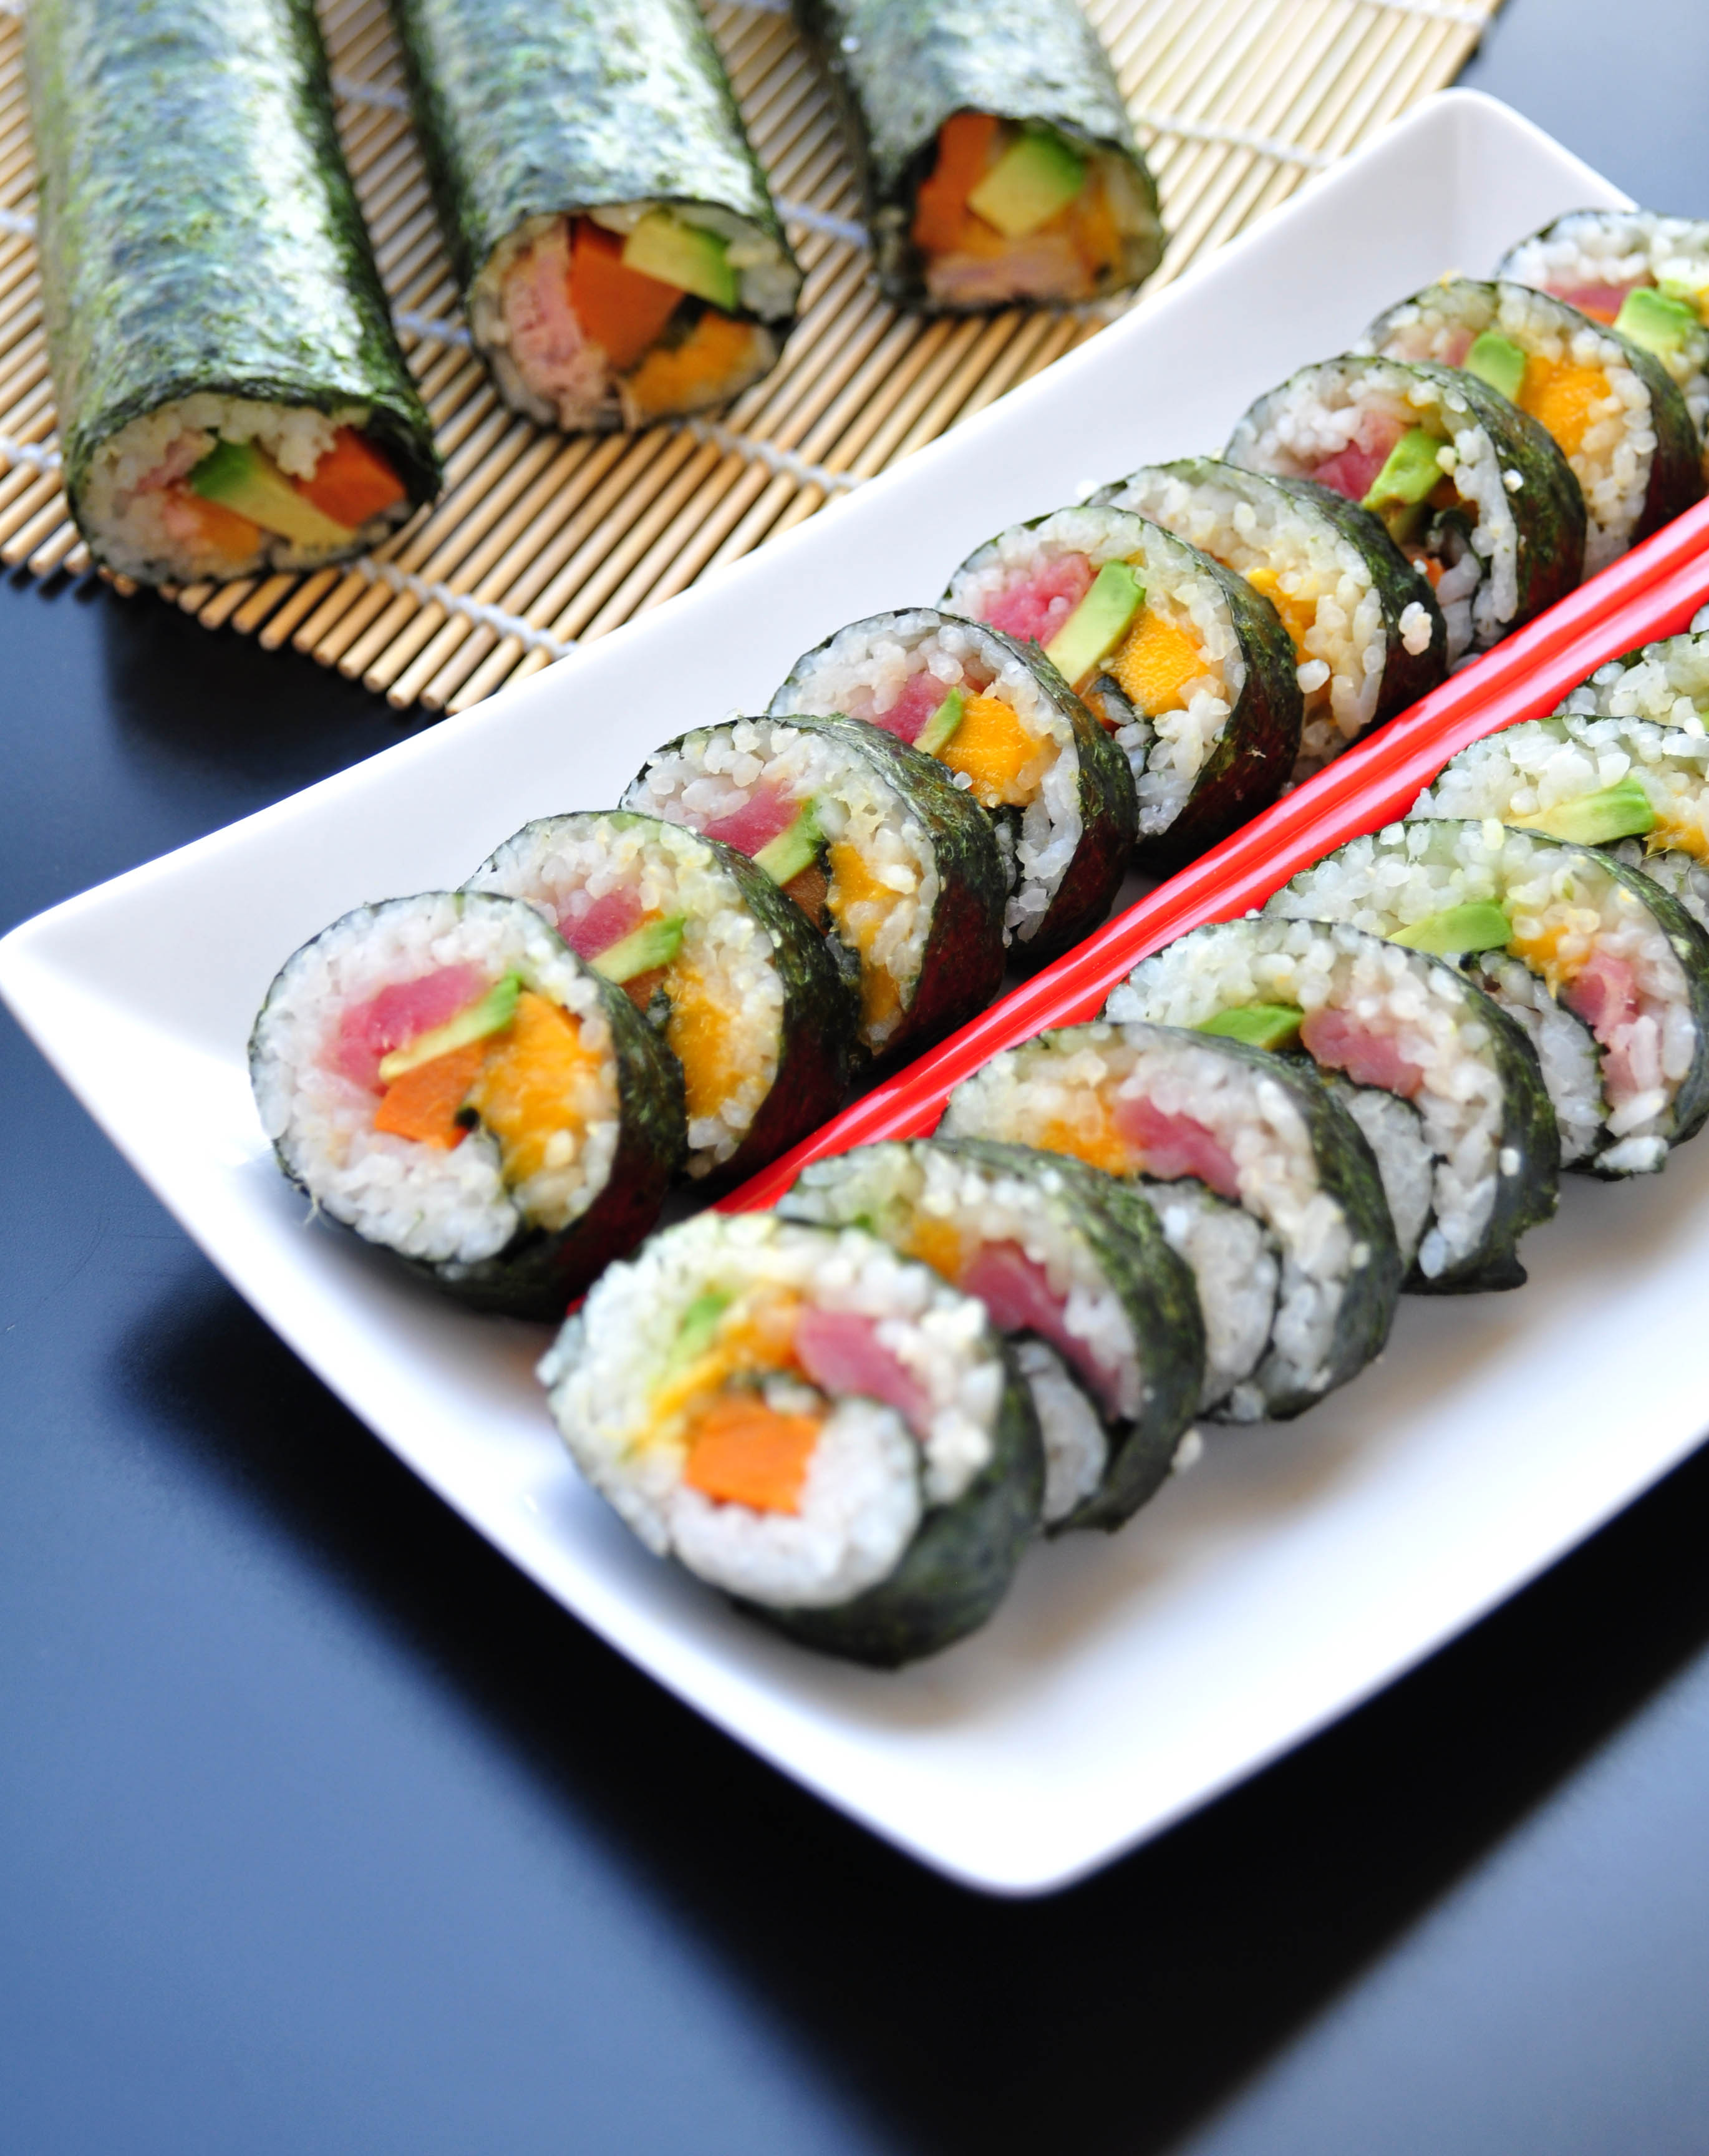 tuna-sushi-maki-rolls2-by-starvingchef.jpg